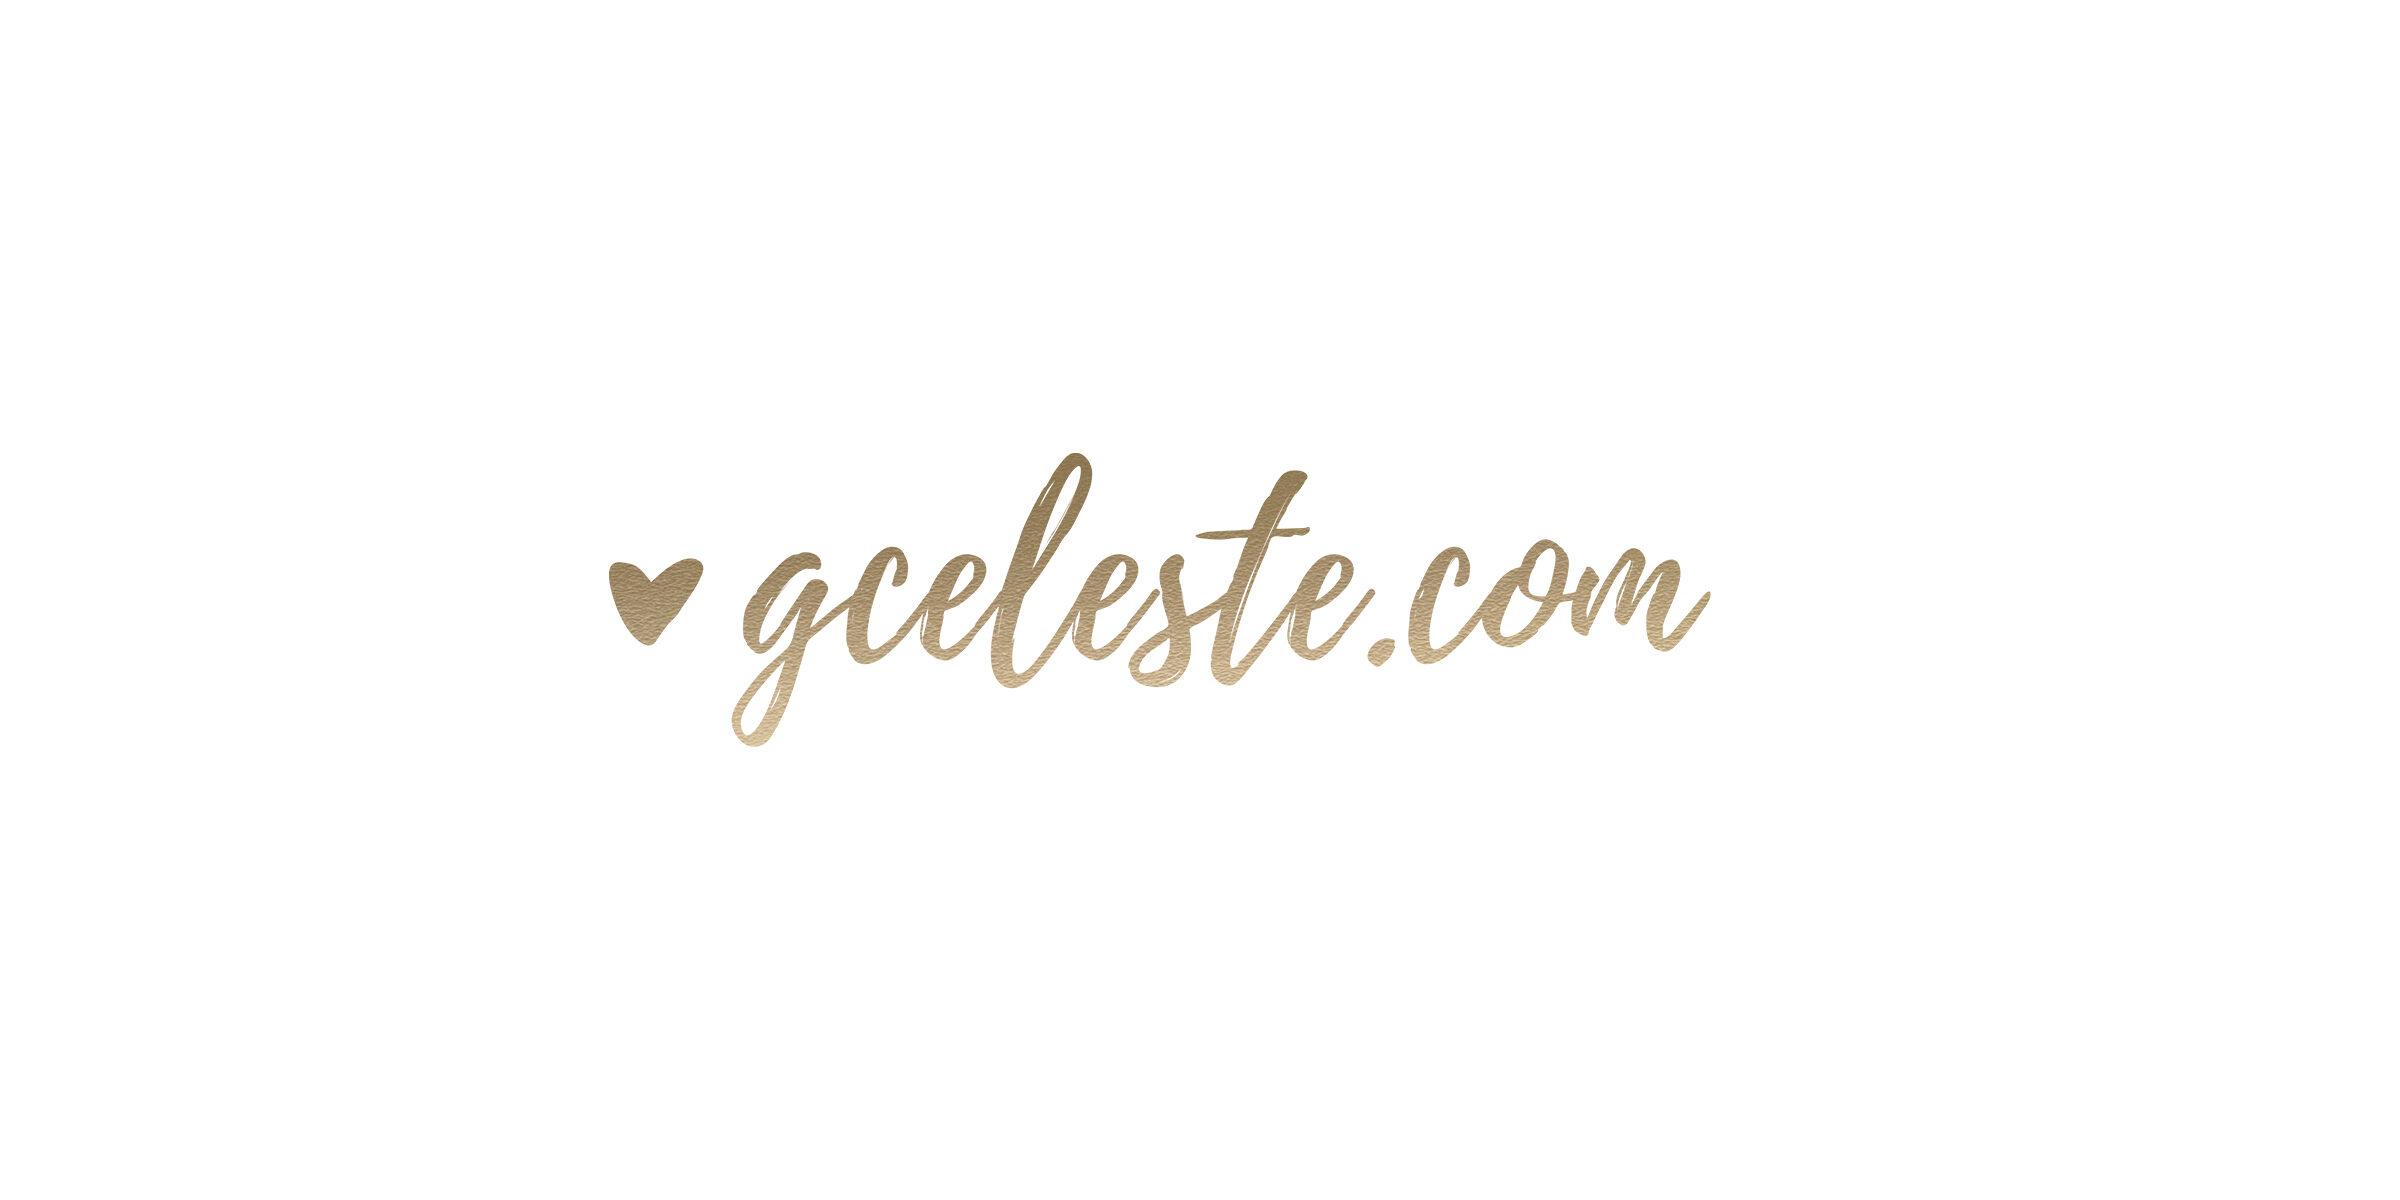 G CELESTE PHOTOGRAPHY, LLC.